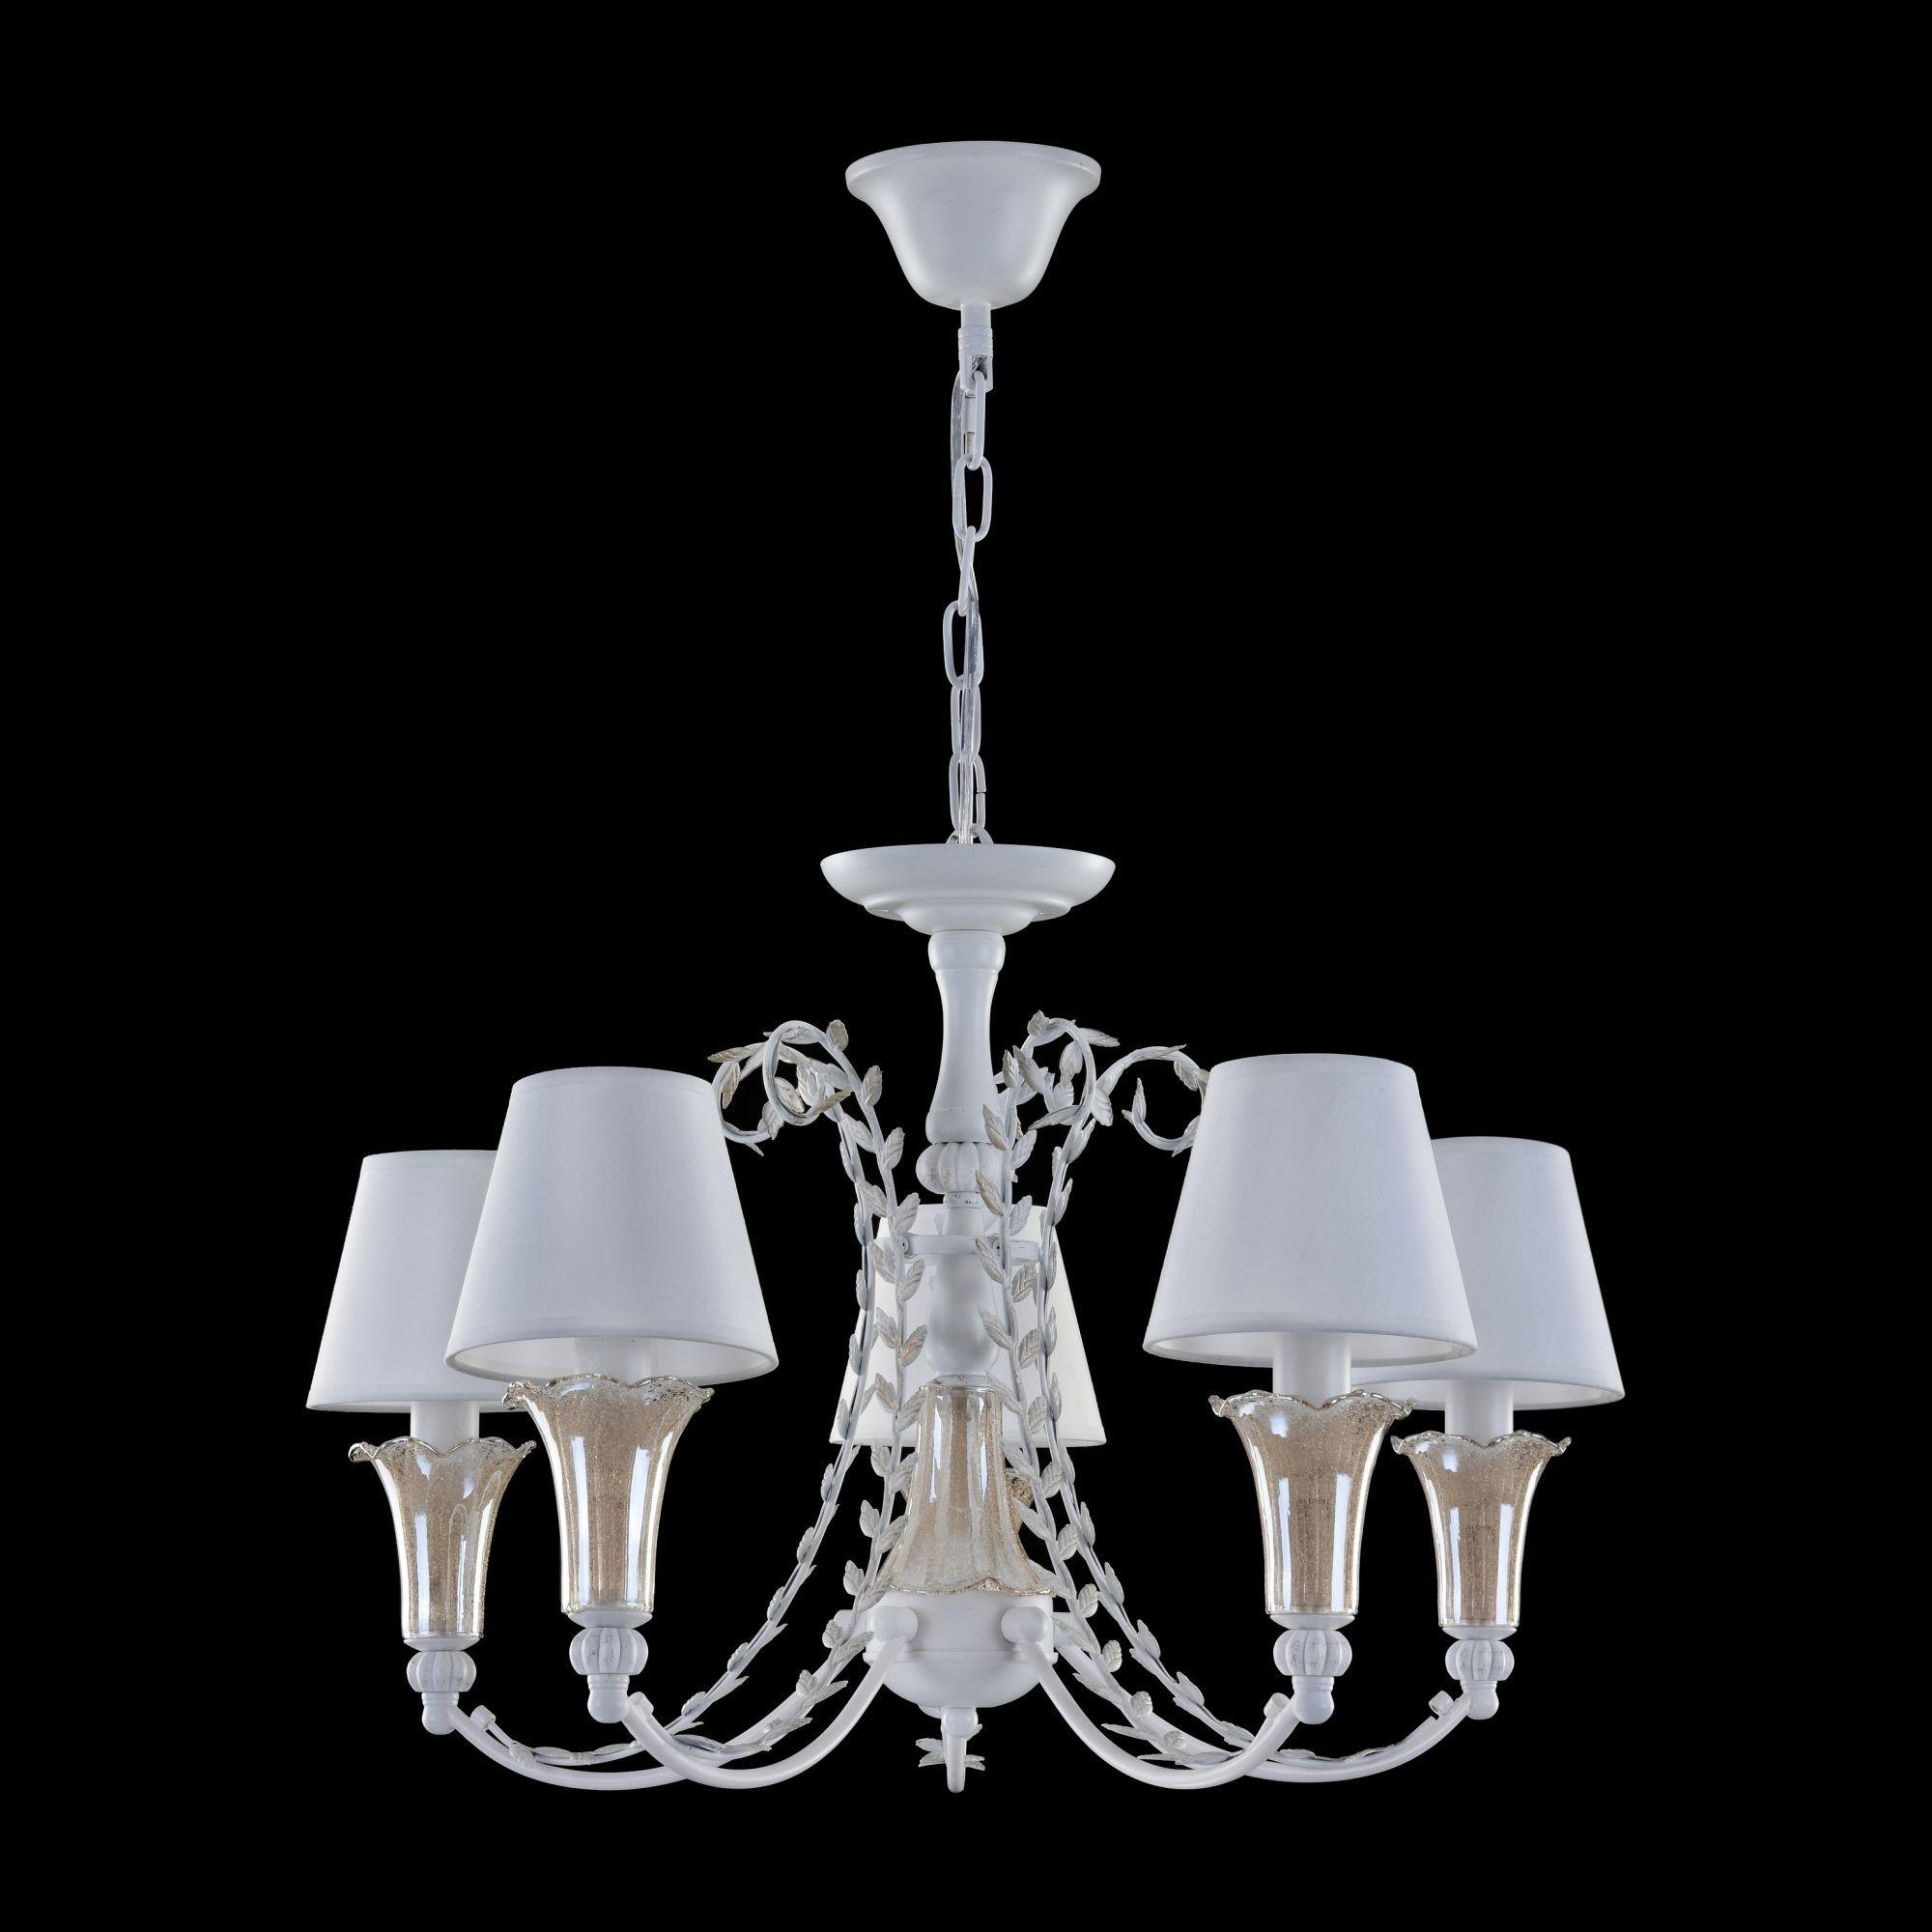 Подвесная люстра Freya Alessa FR2984-PL-05-W, 5xE14x60W, белый, янтарь, металл, стекло, текстиль - фото 4